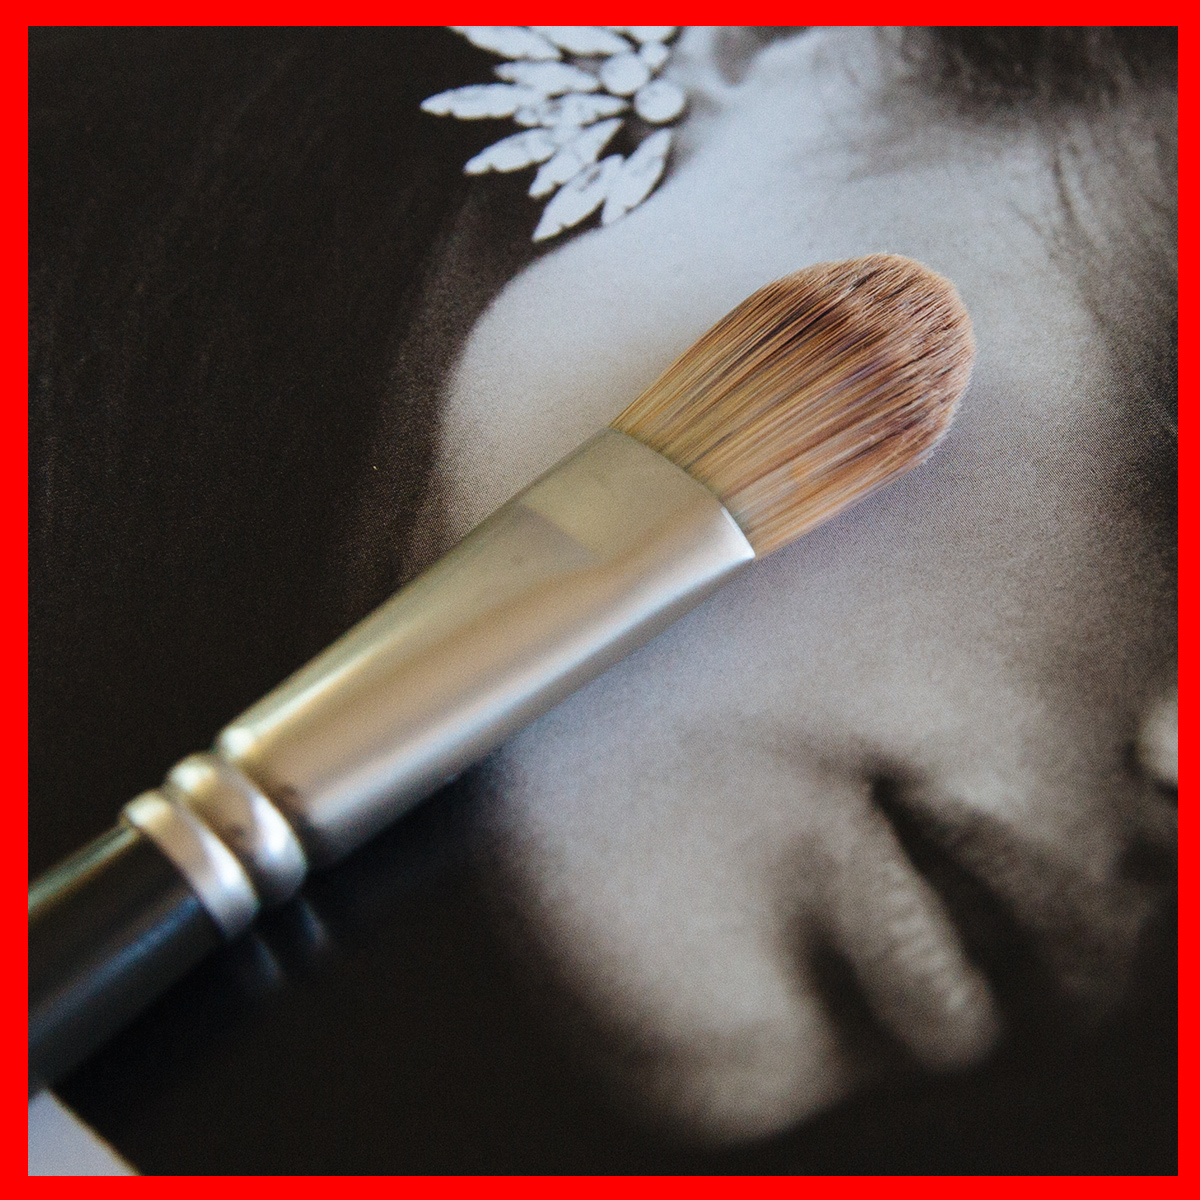 Stylesnooperdan-Beauty-Brushes-Foundation-brush-1.jpg